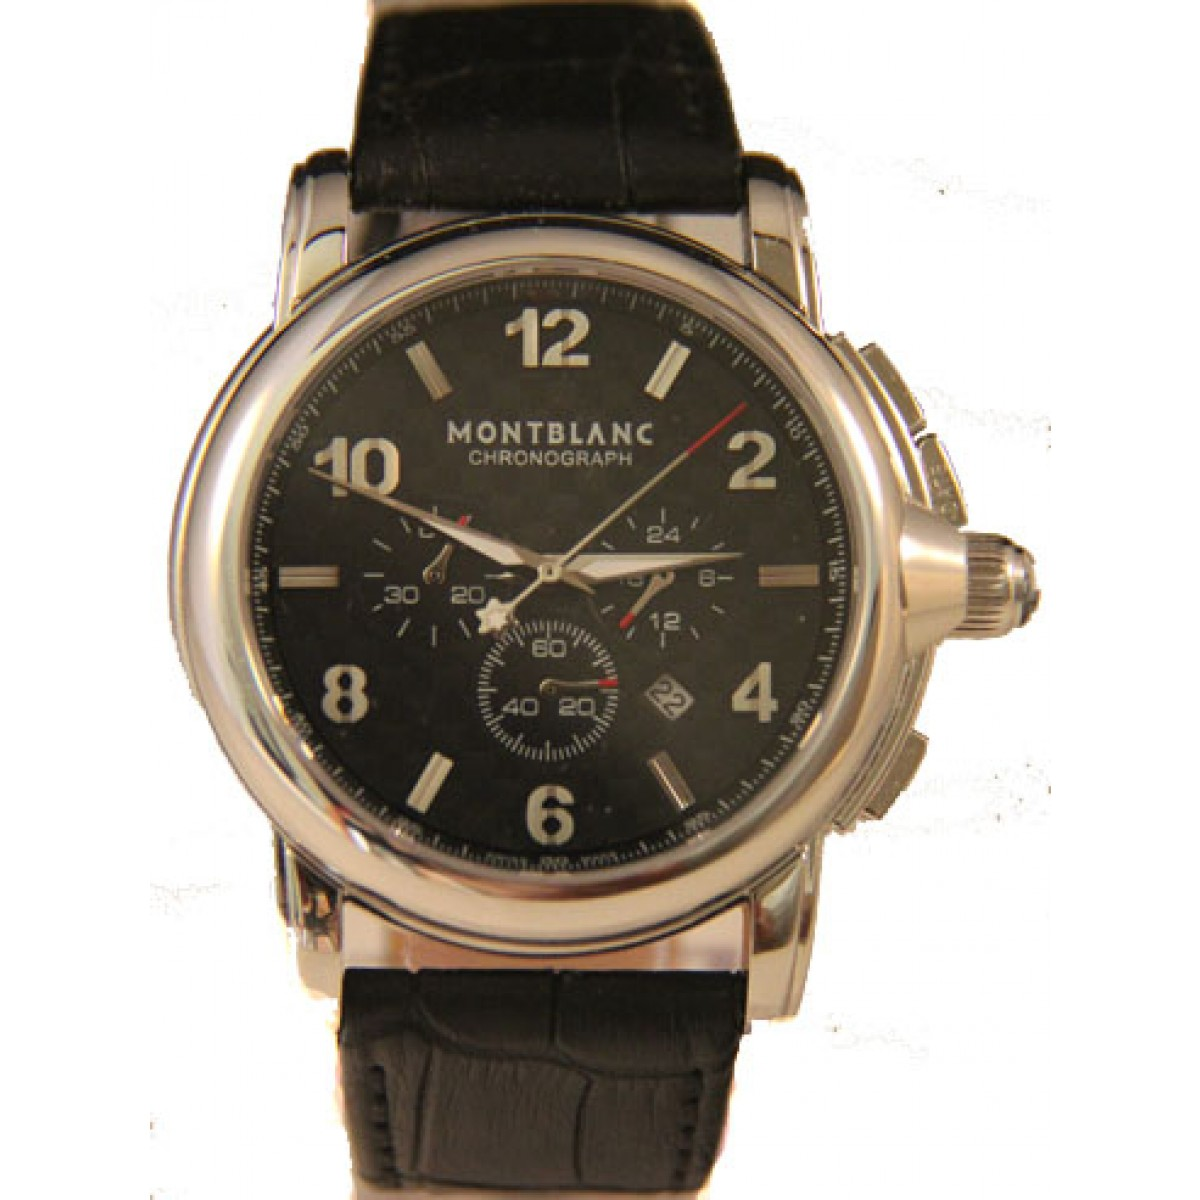 b21ae45b665 Espiar · Relógio Réplica Montblanc Chronograph